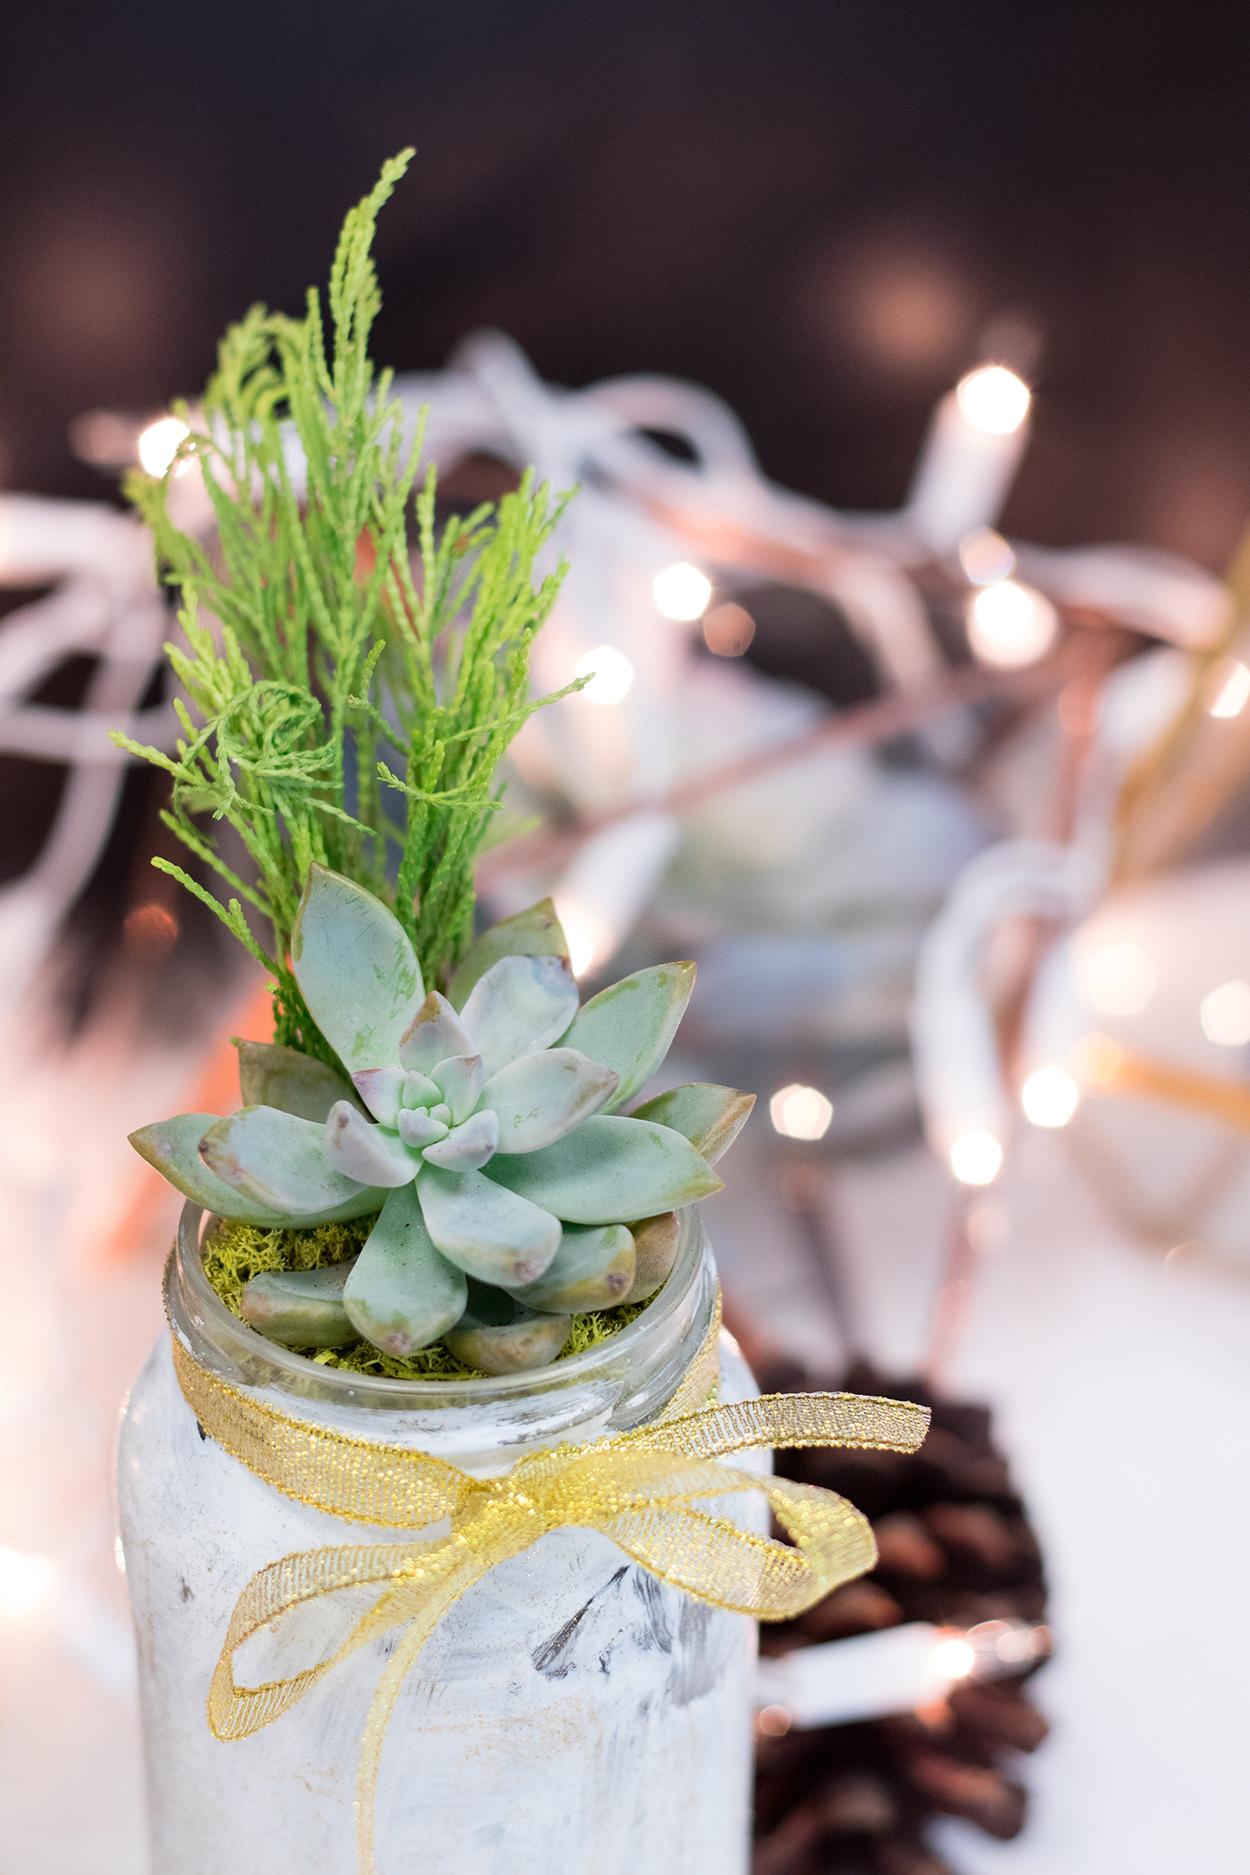 Christmas Succulent | The Key To Blog Blogging Creative Workshop